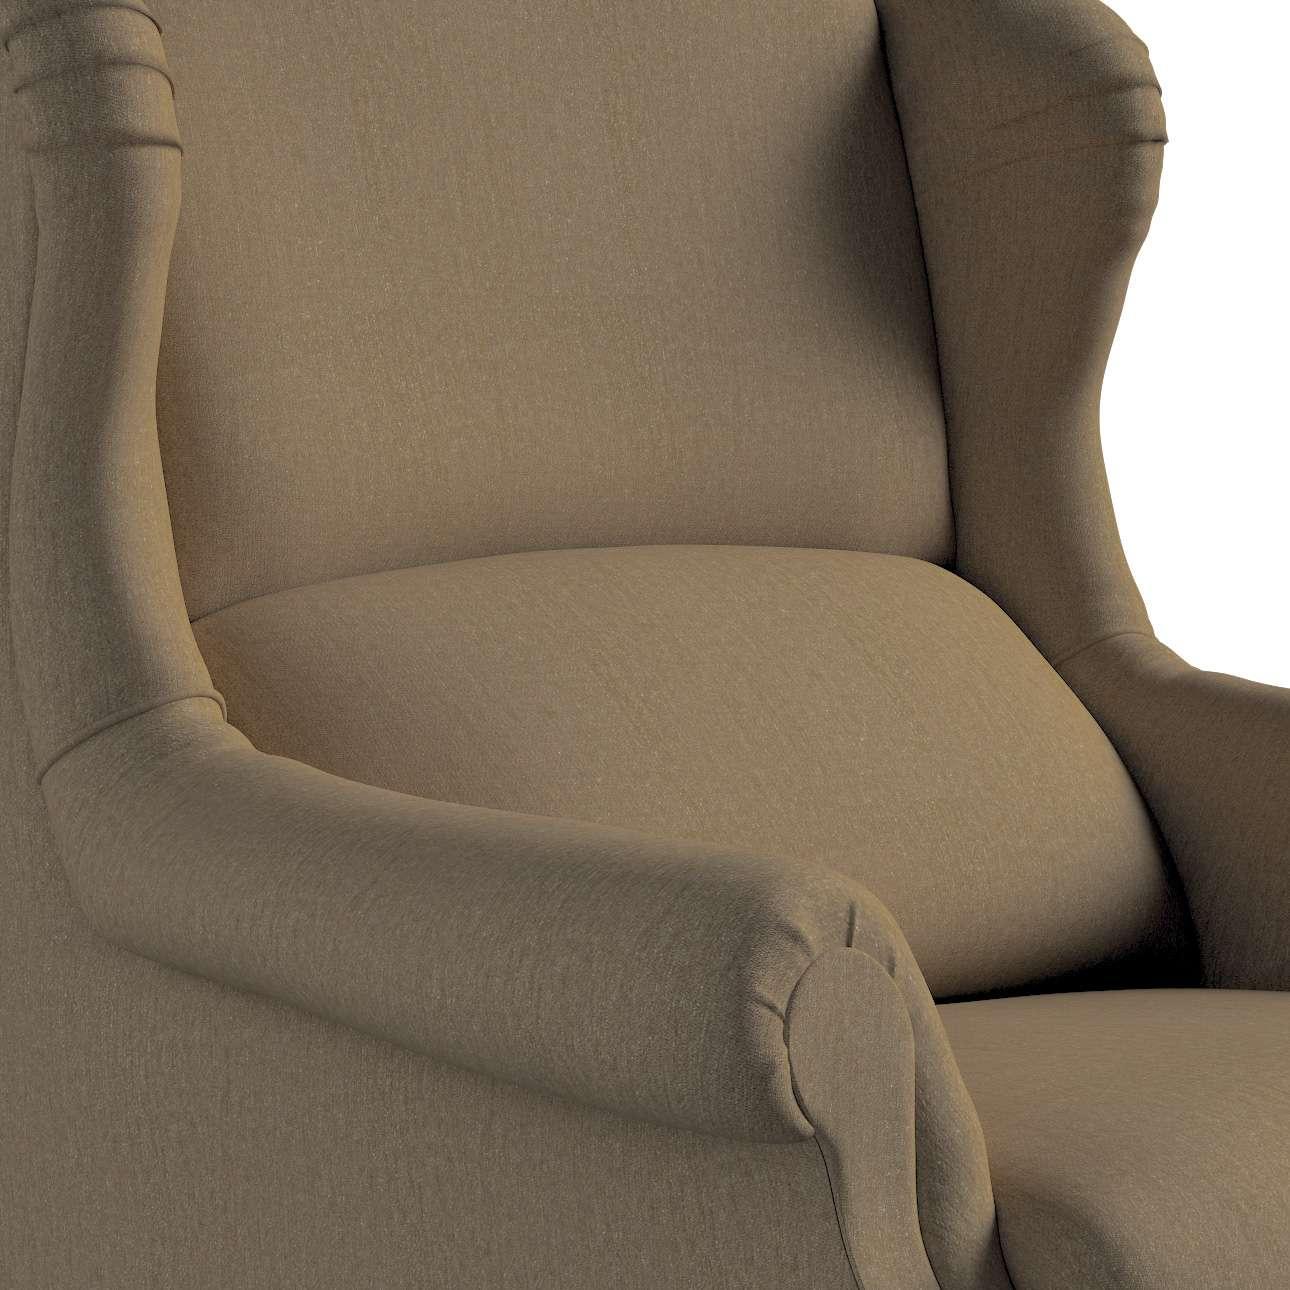 Stilingas Dekoria fotelis 63 x 115 cm kolekcijoje Chenille, audinys: 702-21